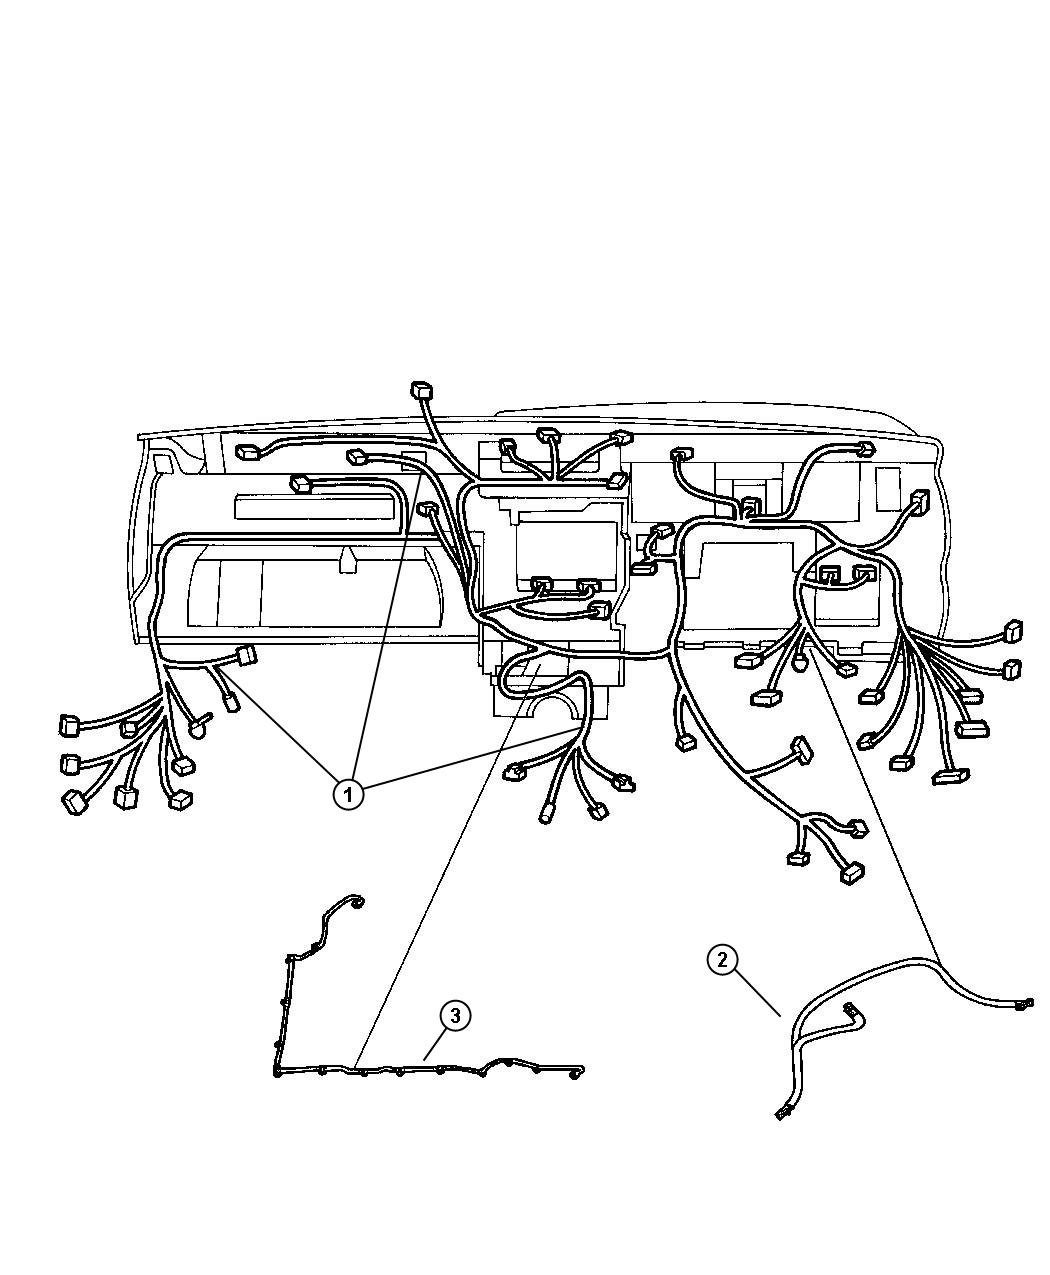 mopar wiring diagrams 2006 srt8